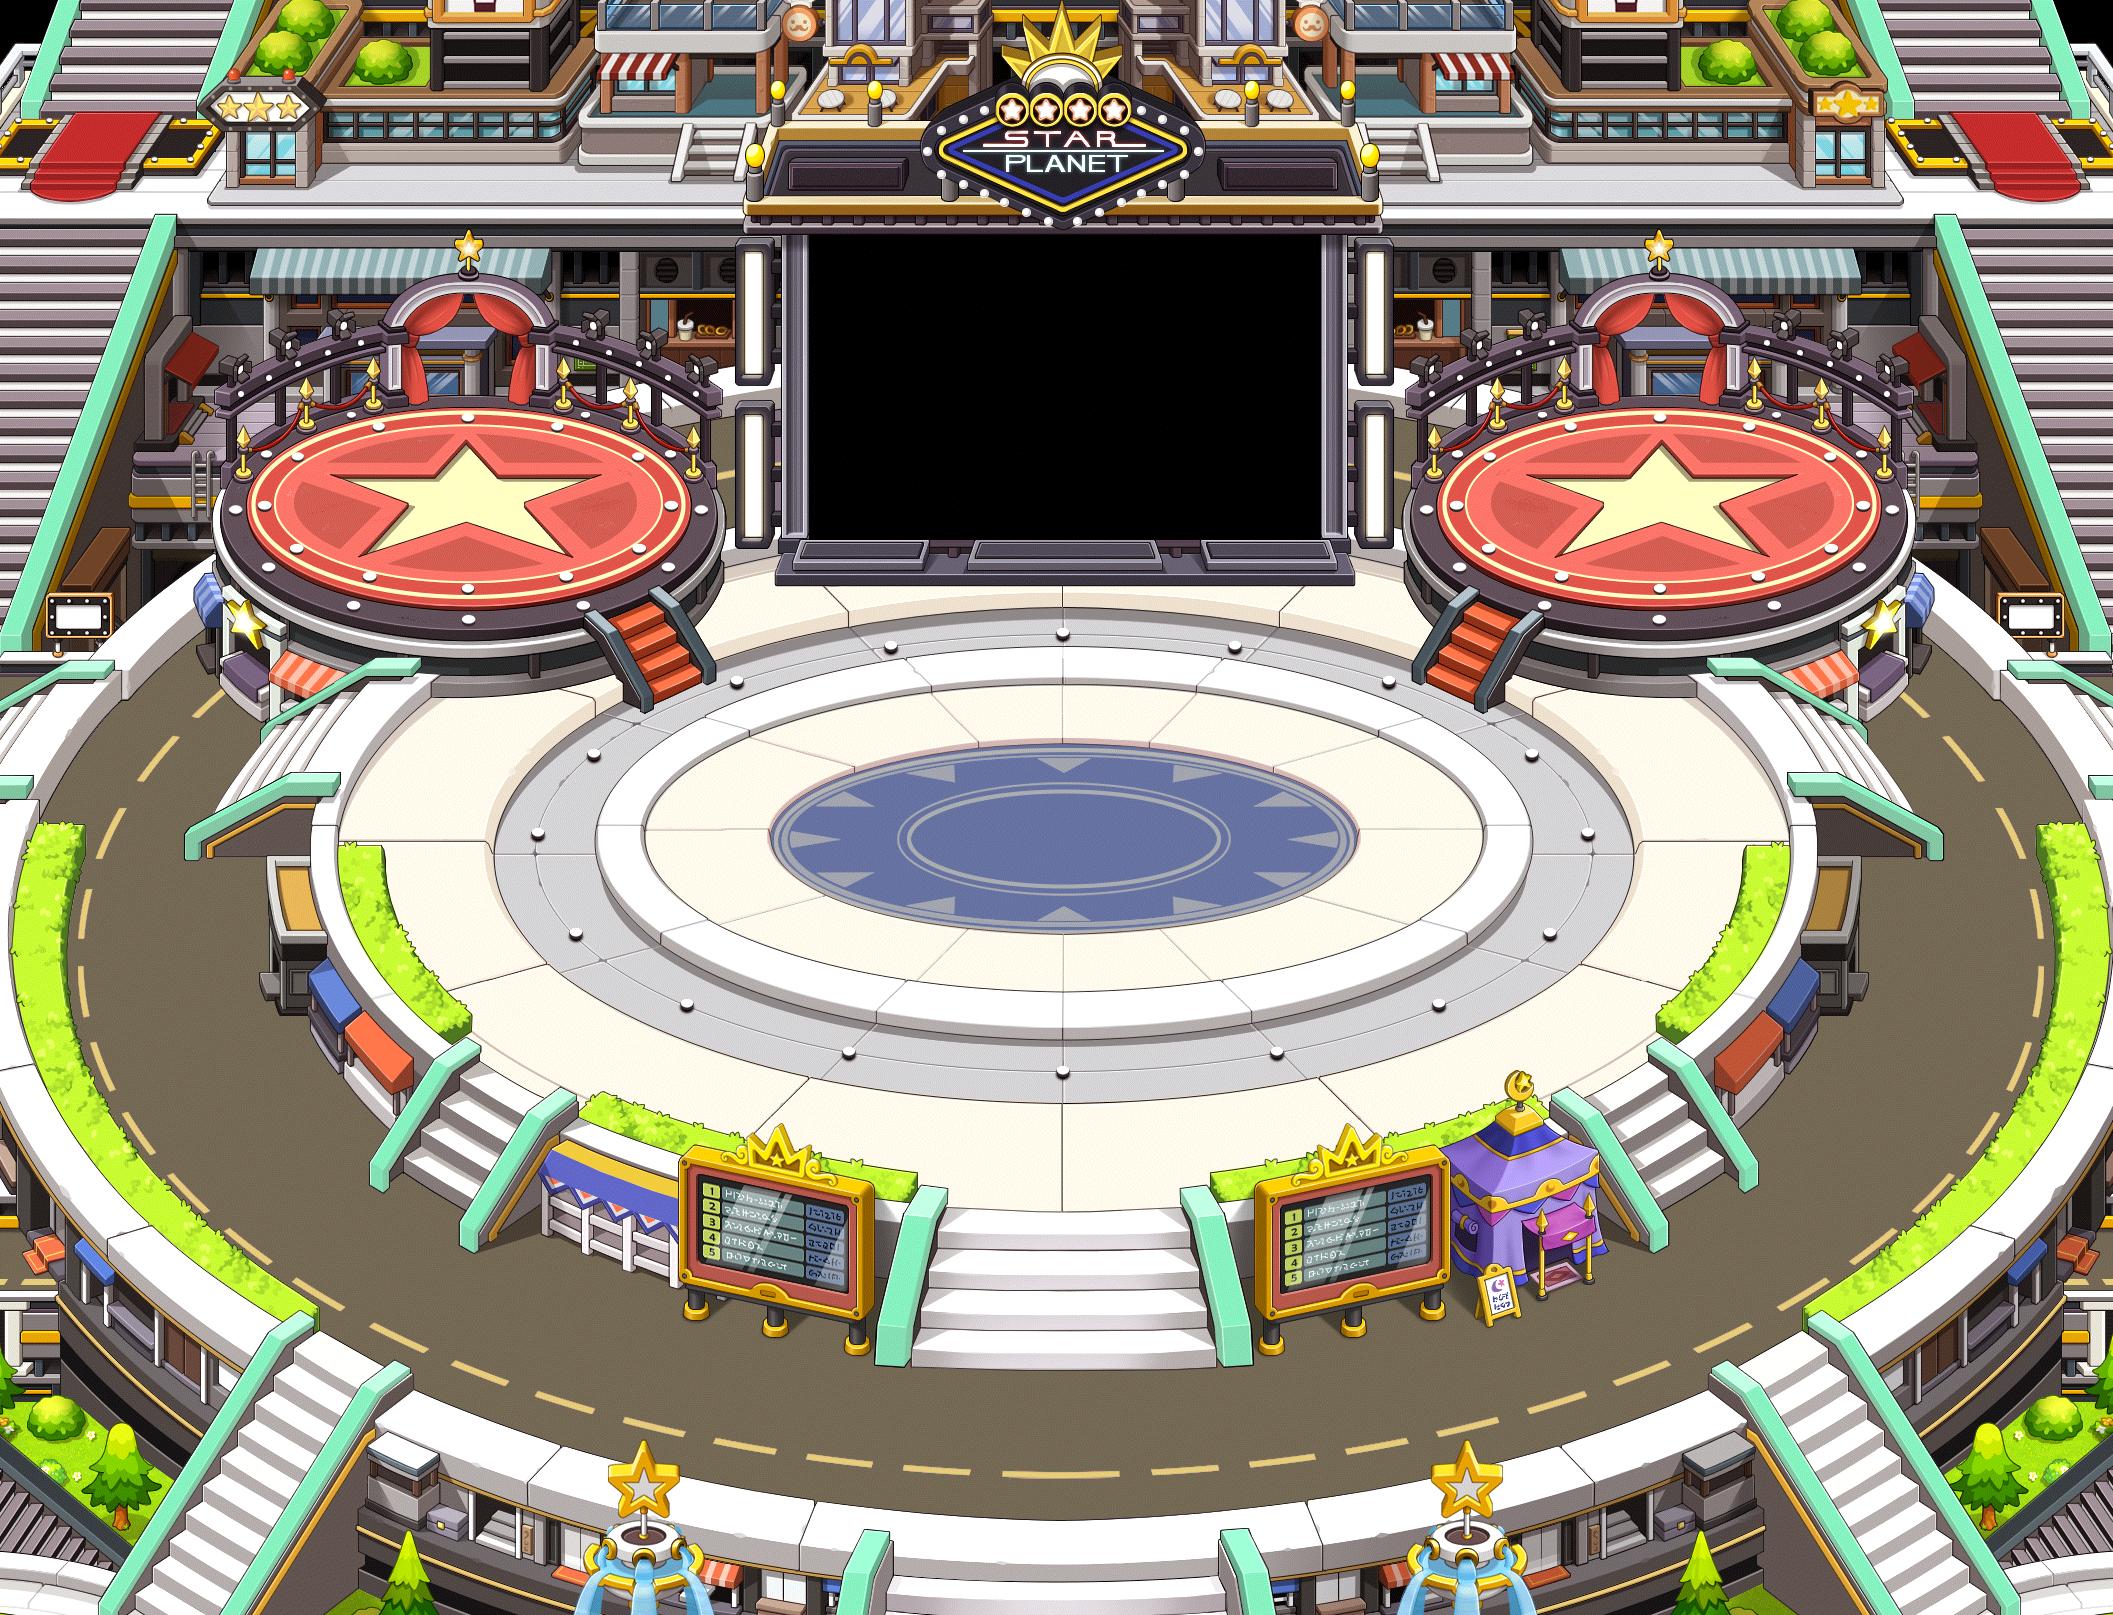 Star Planet Square